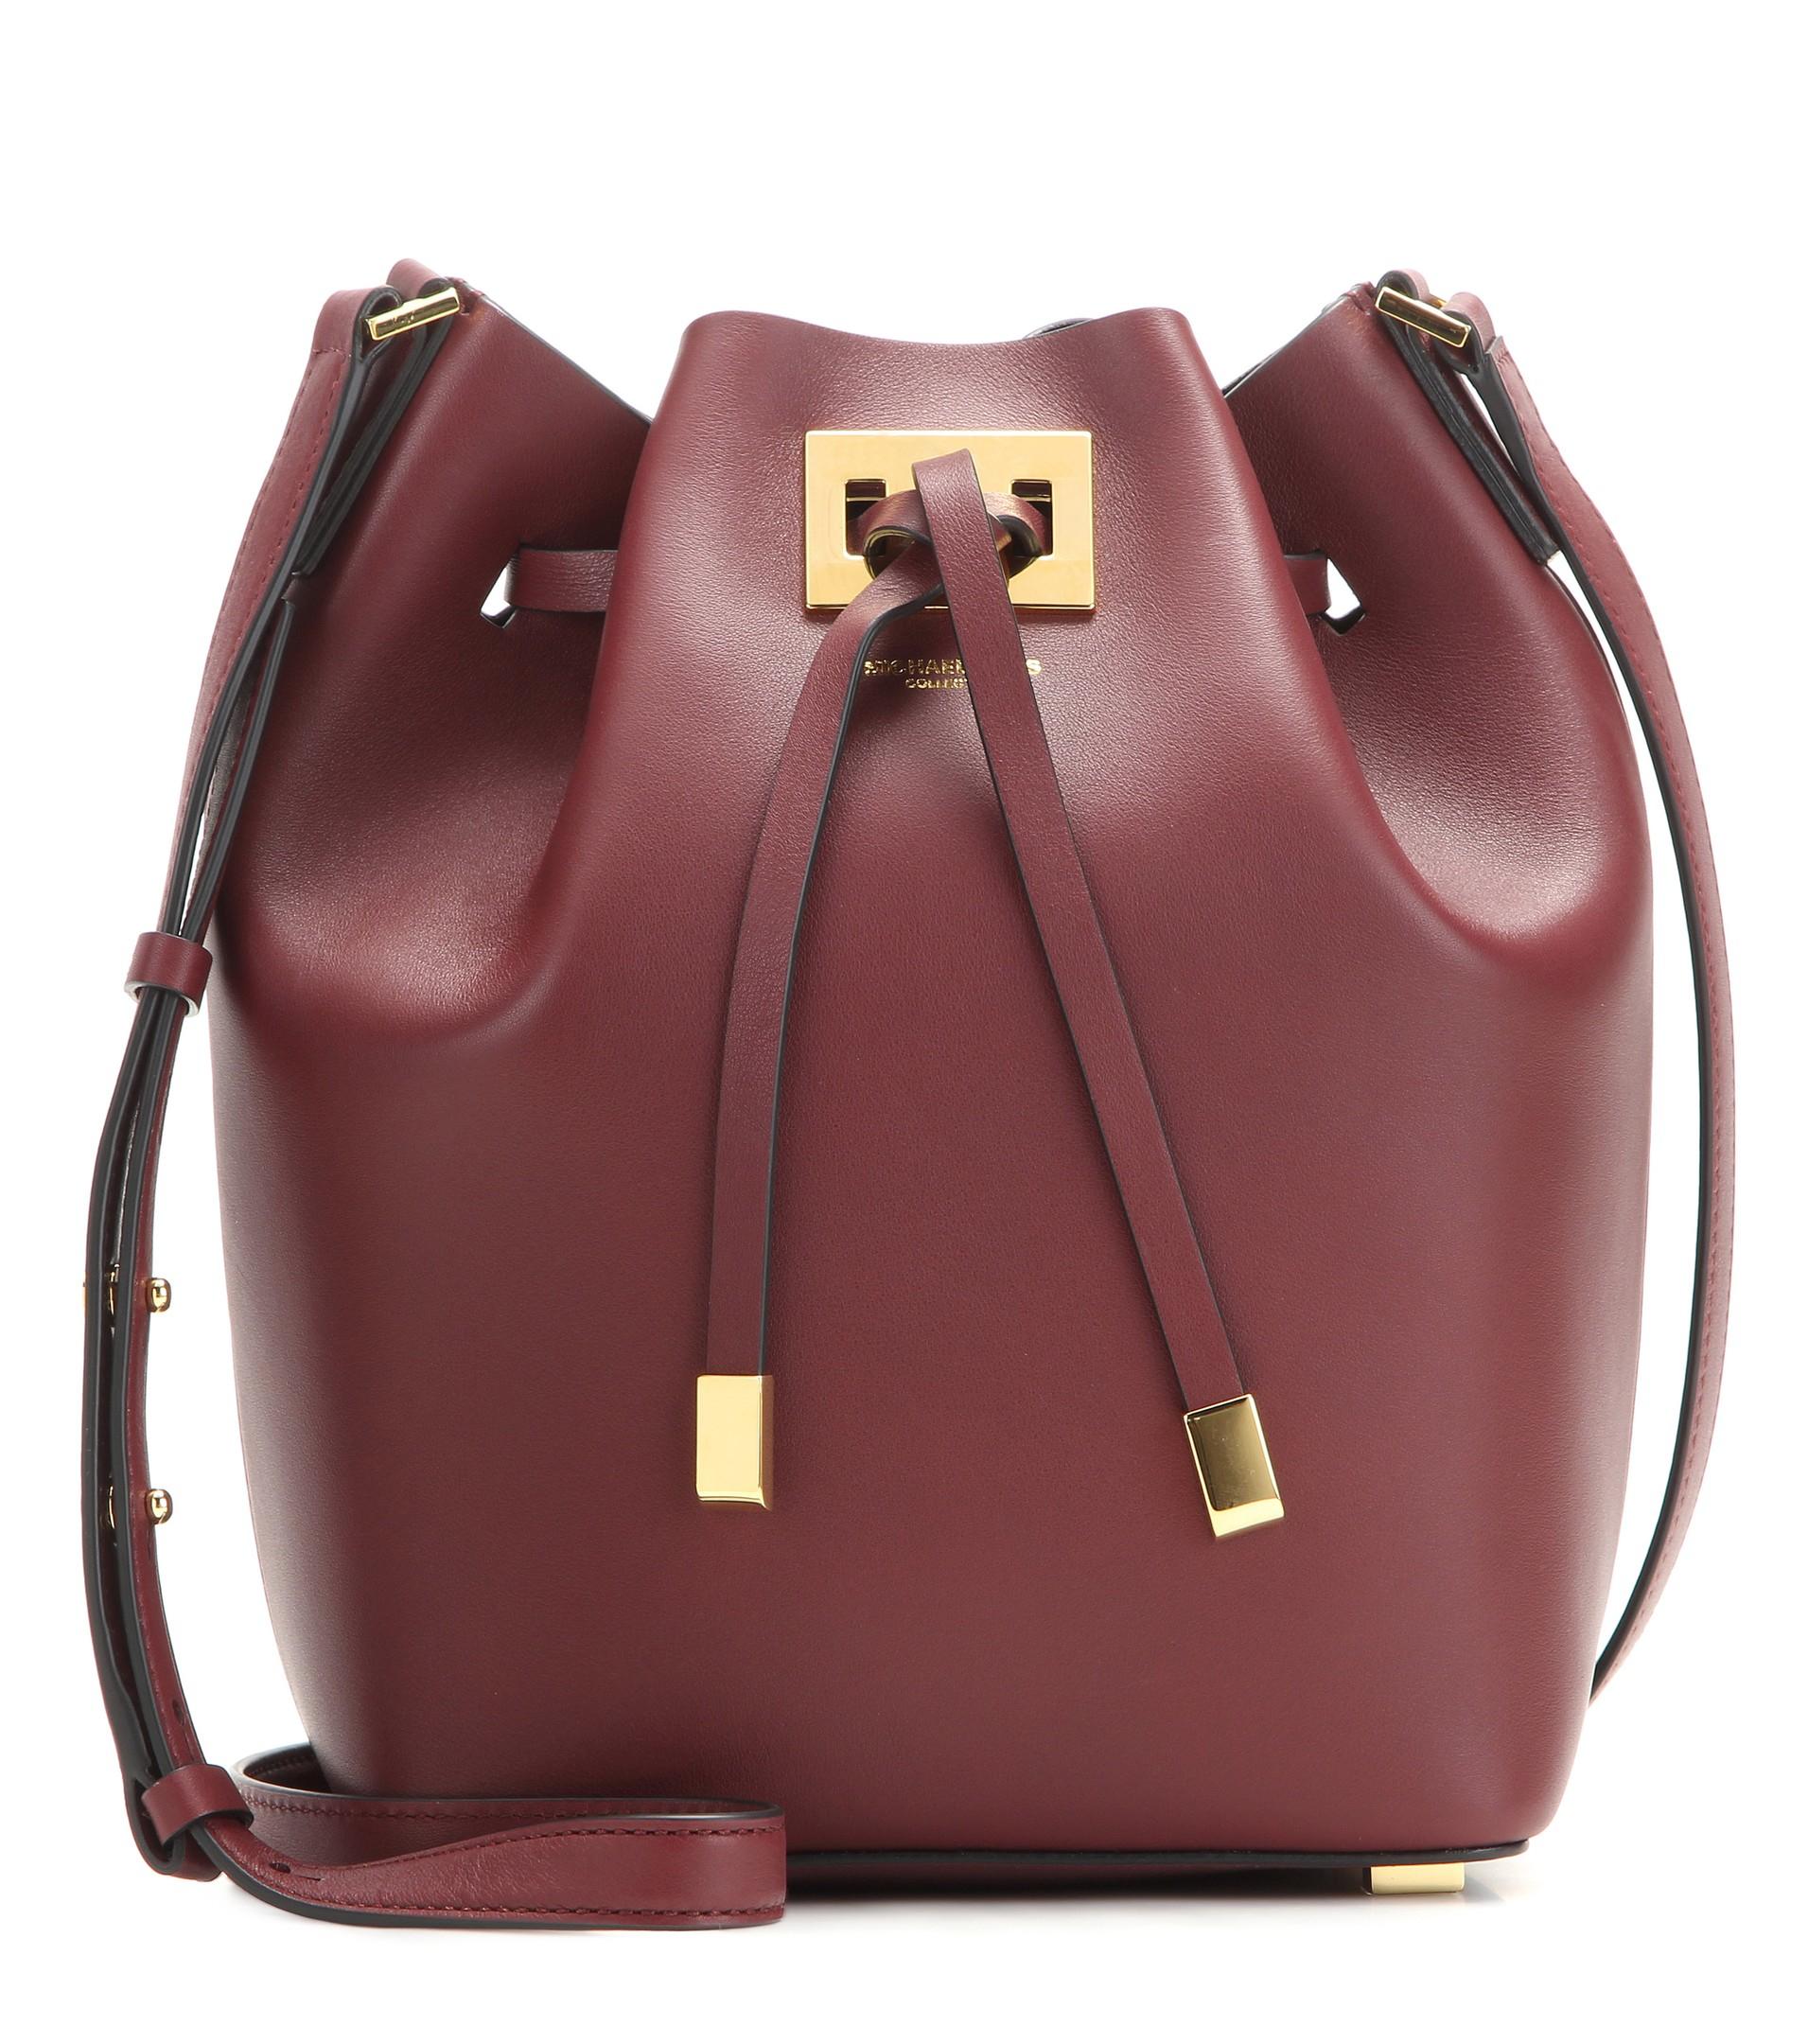 puma suede classic prezzo handbags